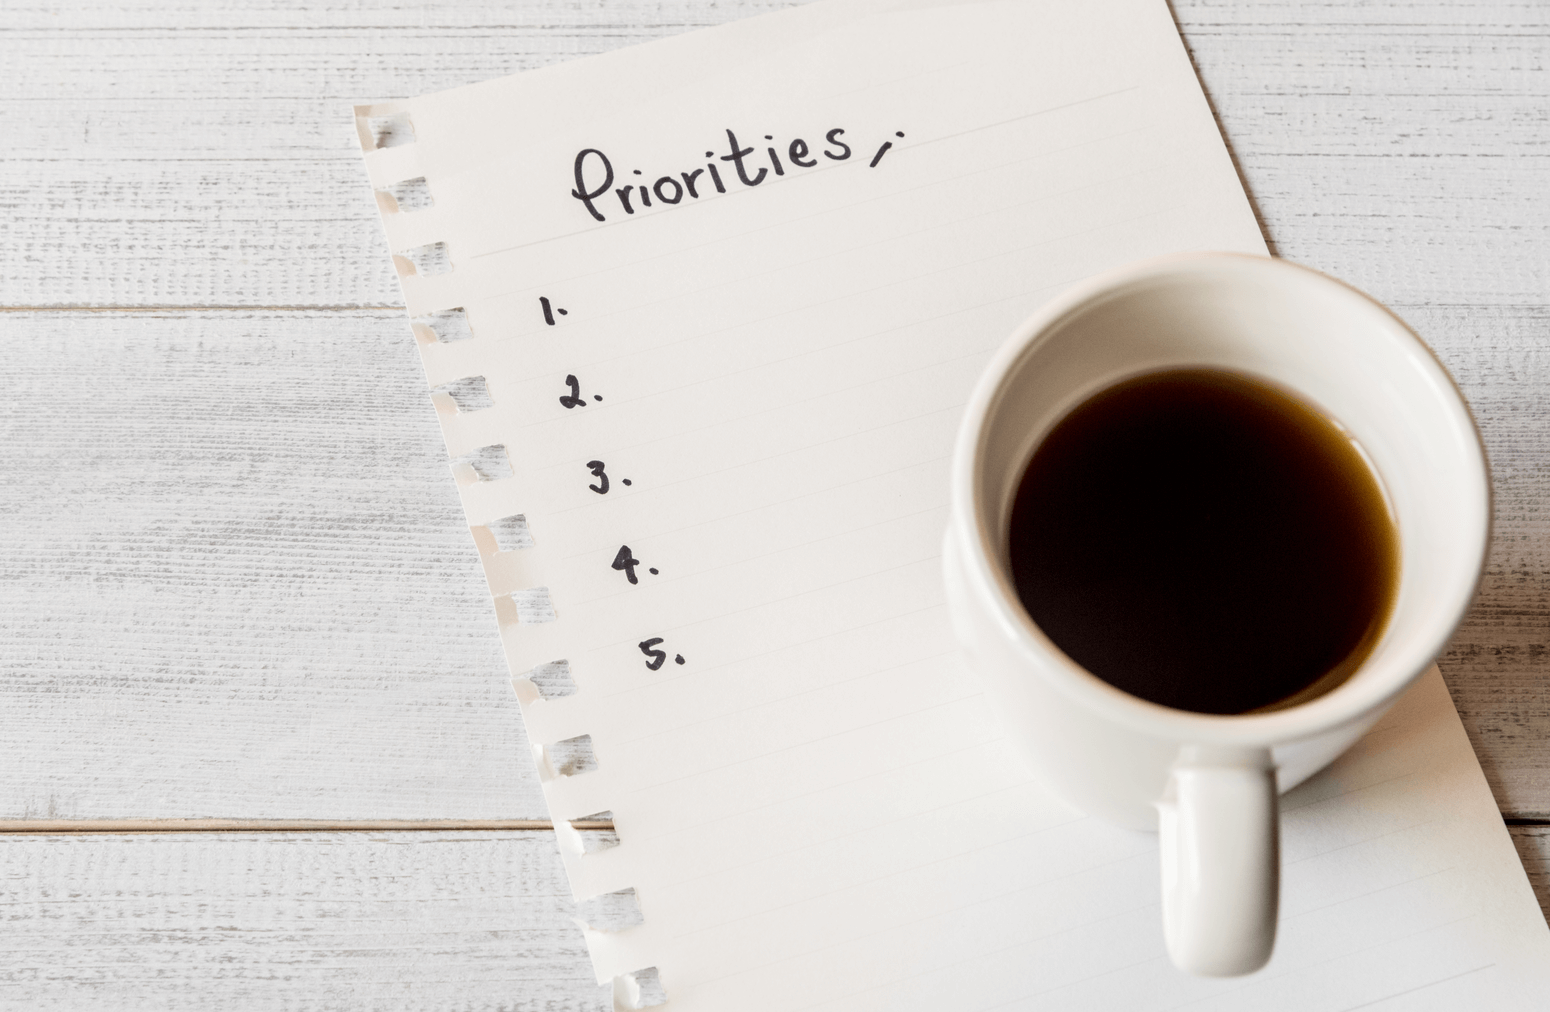 priorities fiqh awlawiyyat